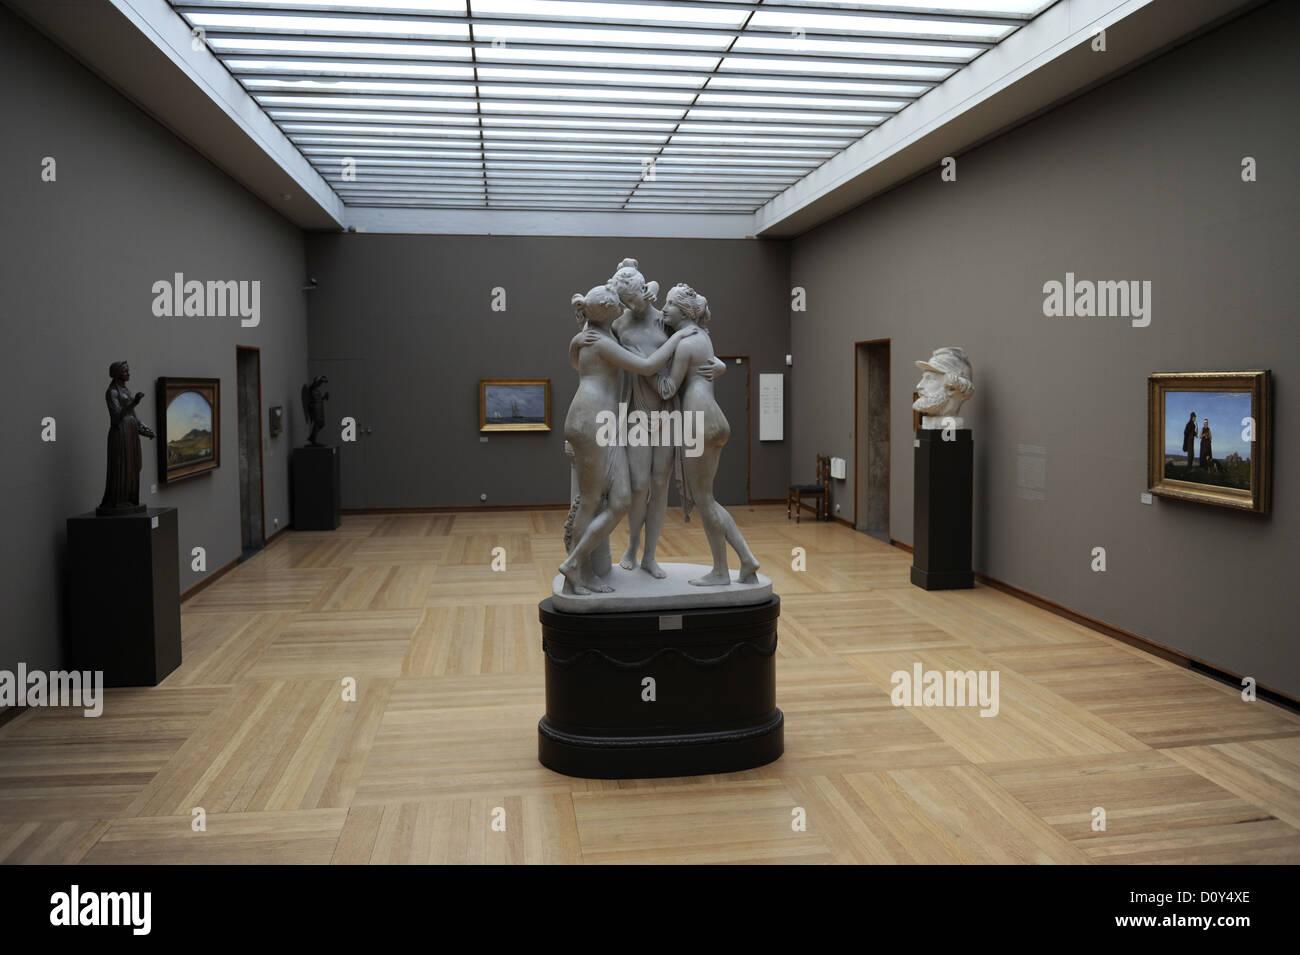 Marble sculpture group of the Three Graces by the italian sculptor Antonio Canova (1757-1822). Ny Carlsberg Glyptotek. Stock Photo